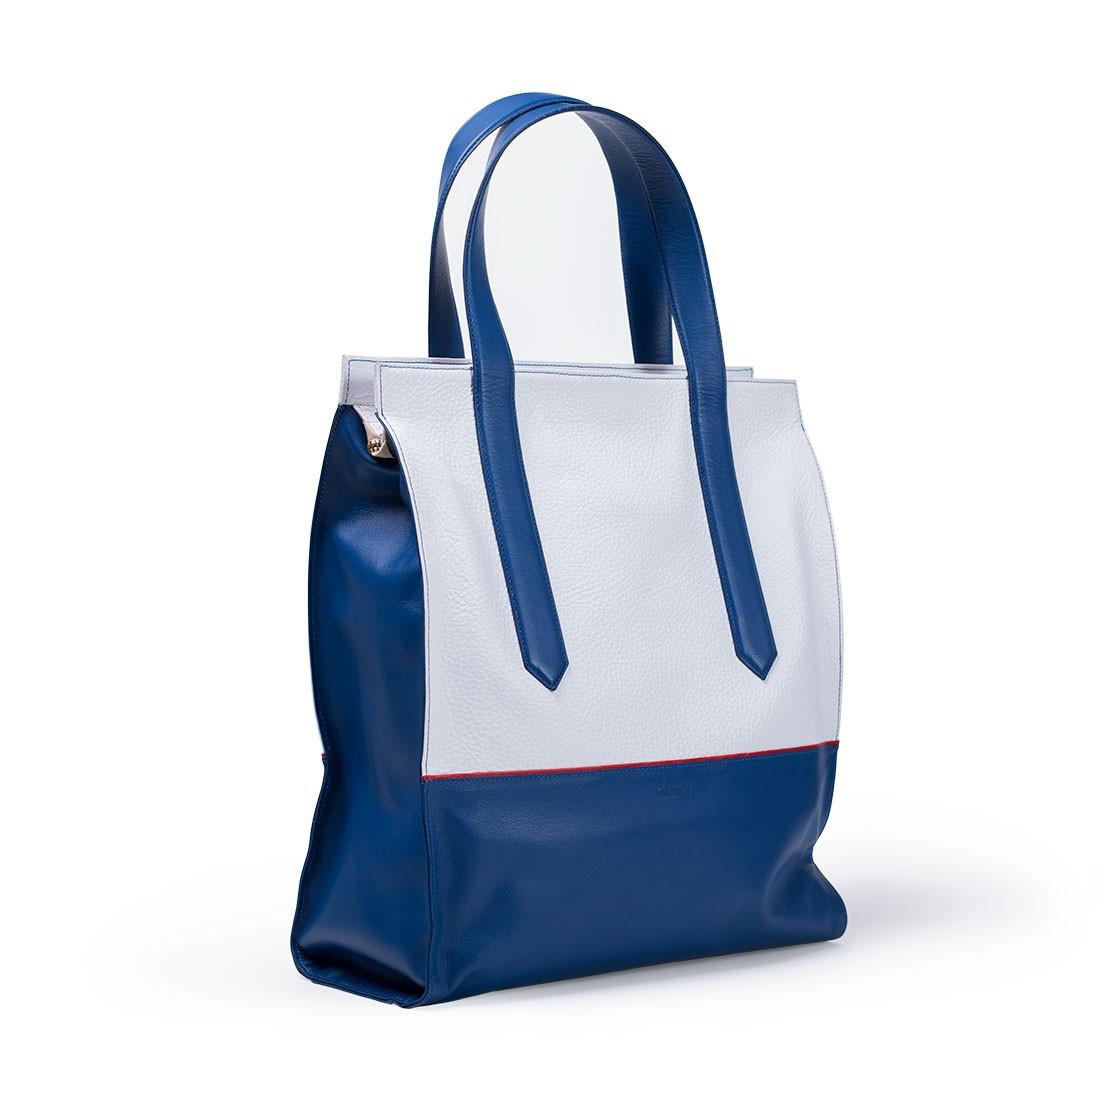 Sac A Main Blanc Et Bleu : Cabas en cuir bleu et blanc carokhoto sacs ? main